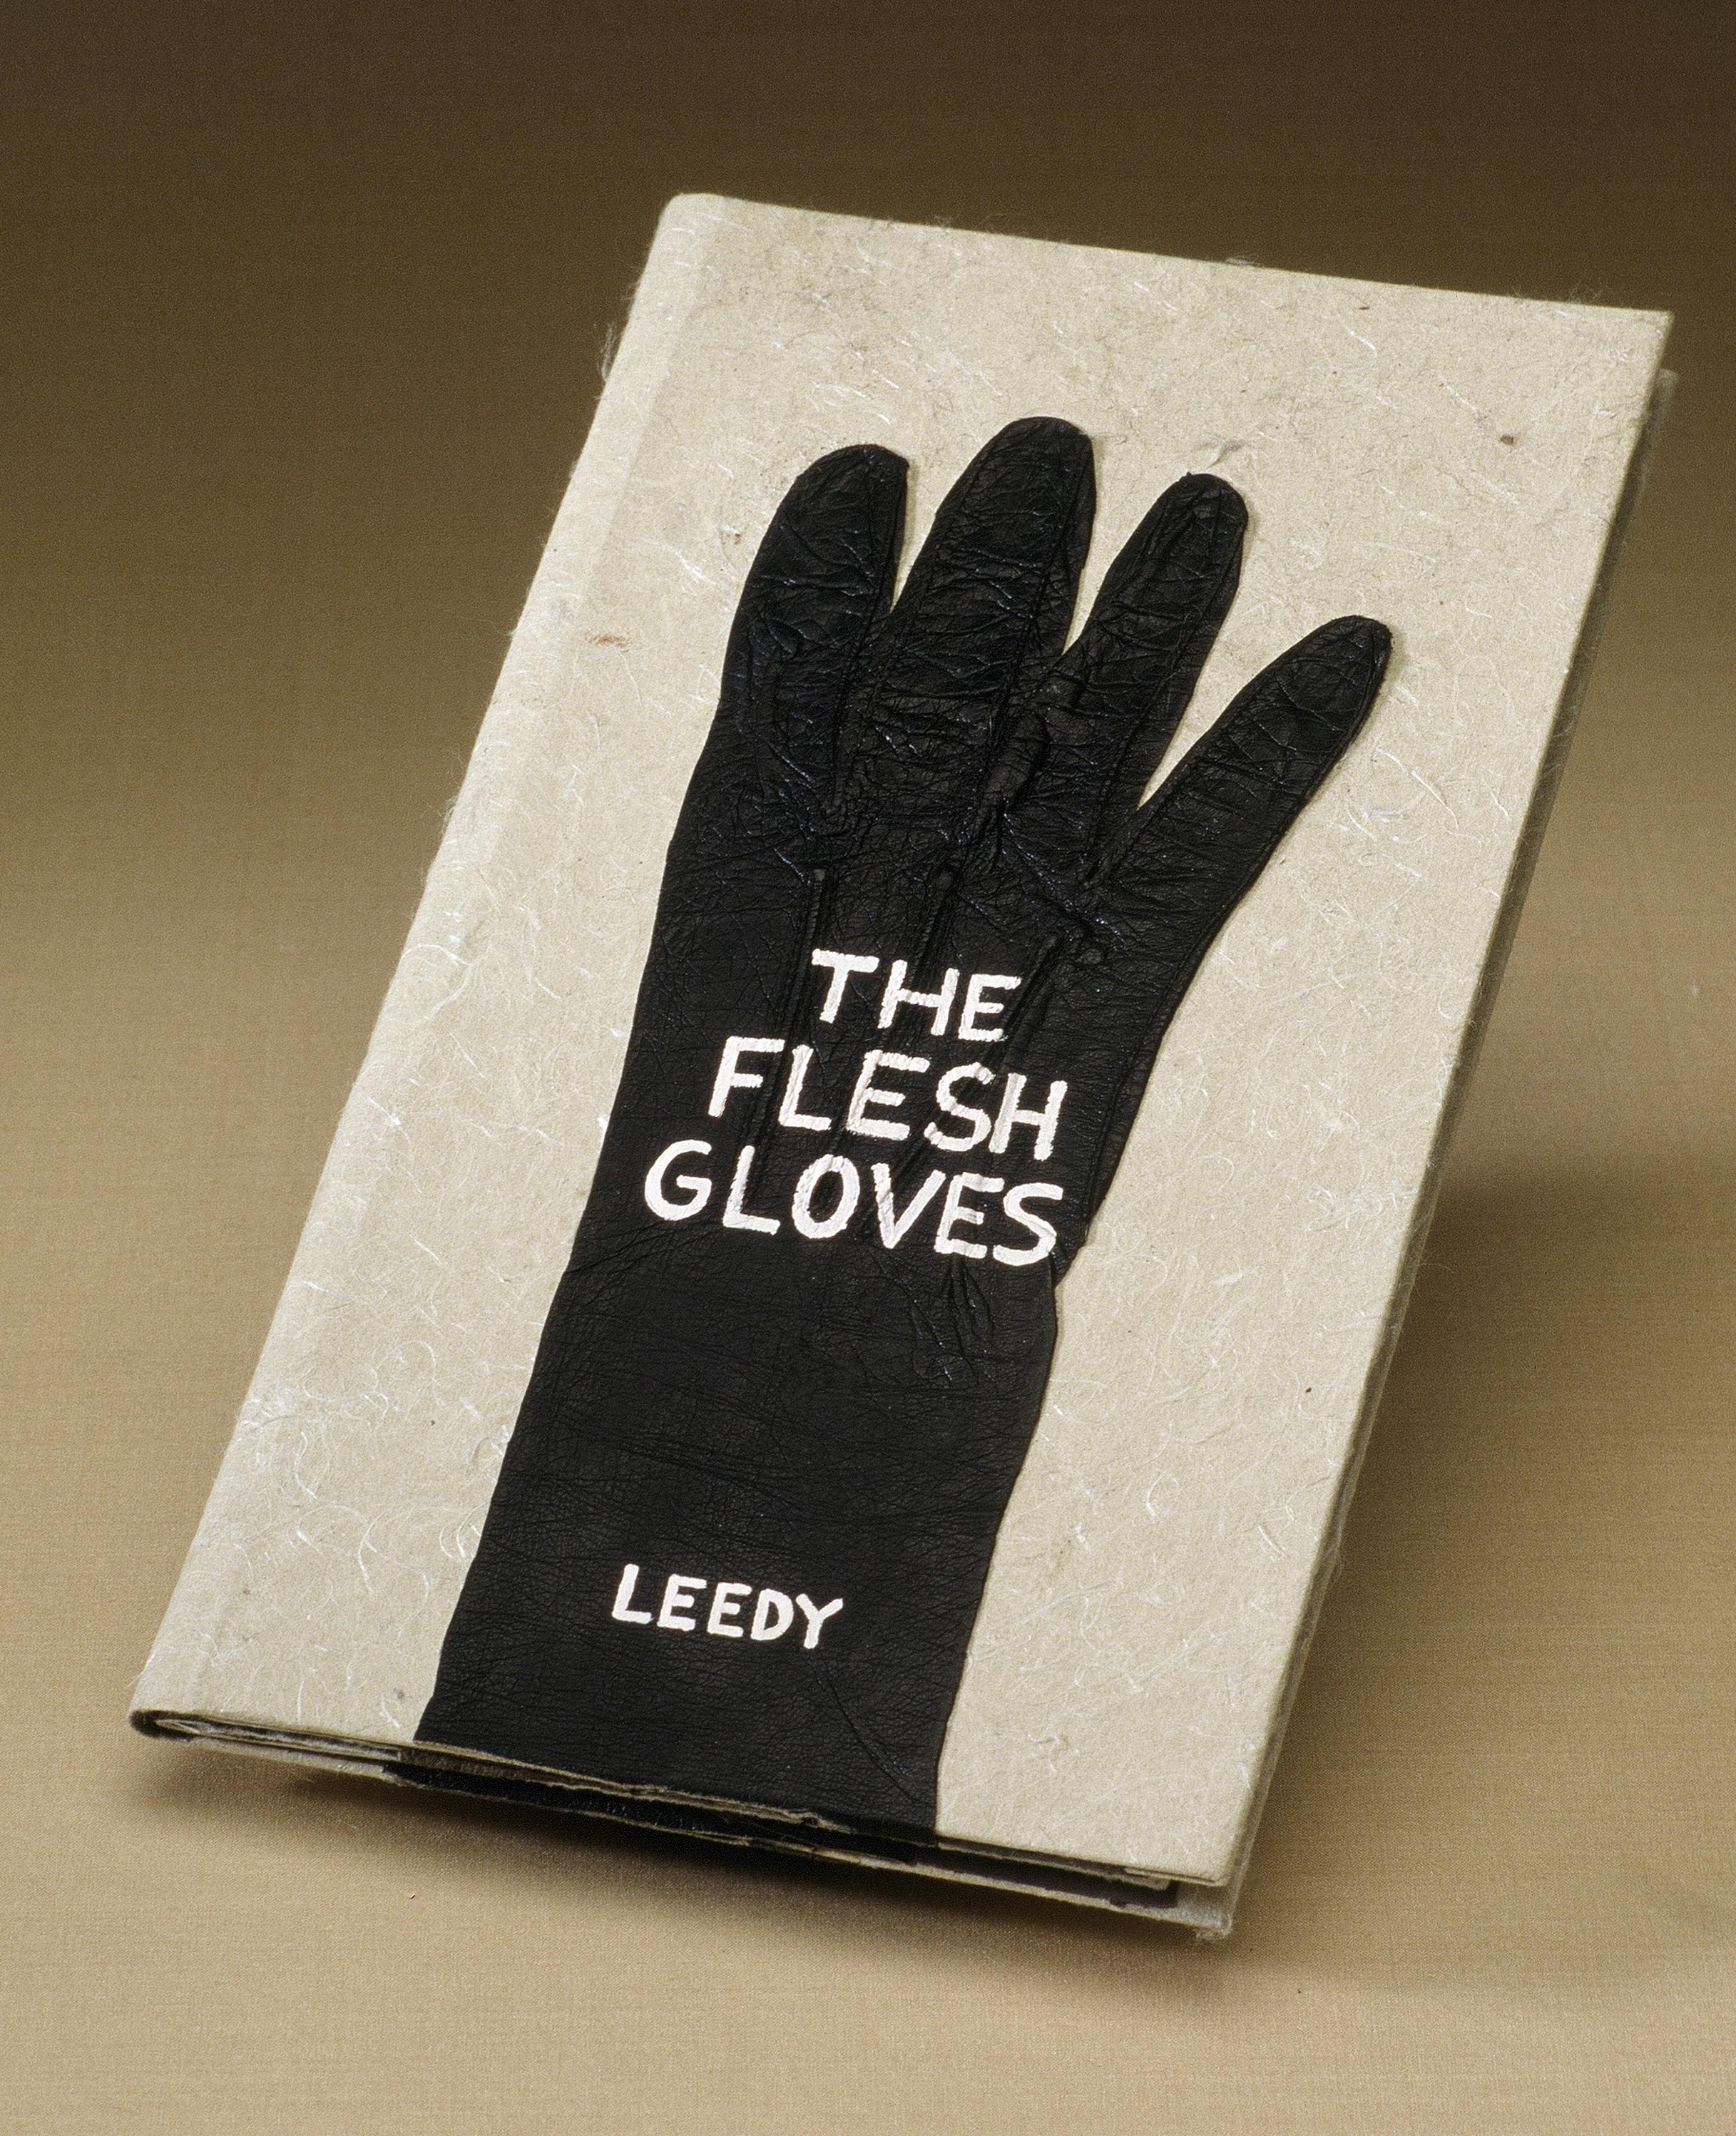 the flesh gloves_cover_crop.jpg